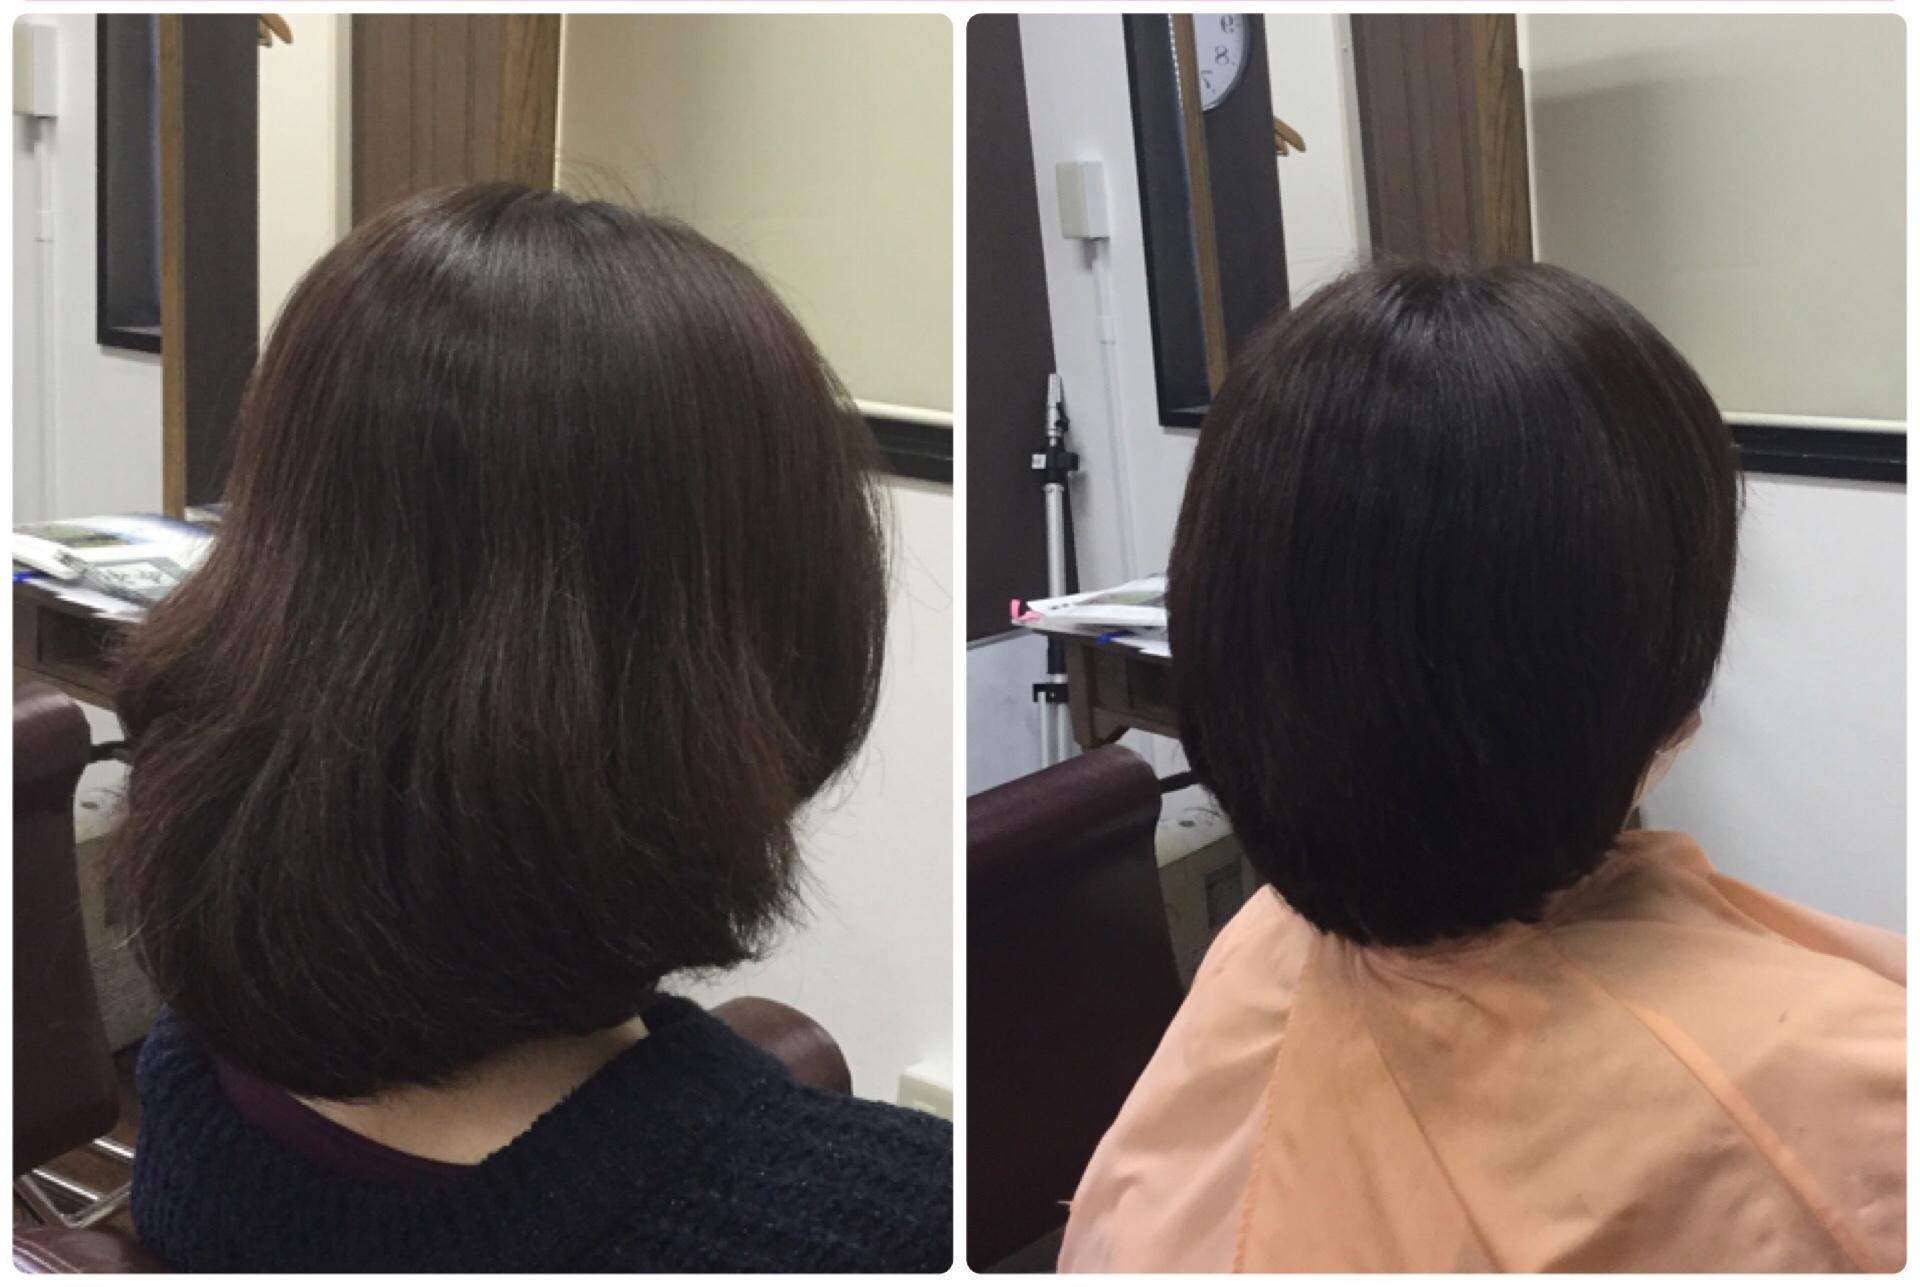 I白髪を増やすヘアカラー【10年後20年後も髪に頭皮を健康にする天然100%ヘナ】神戸くせ毛専門美容室アバディ